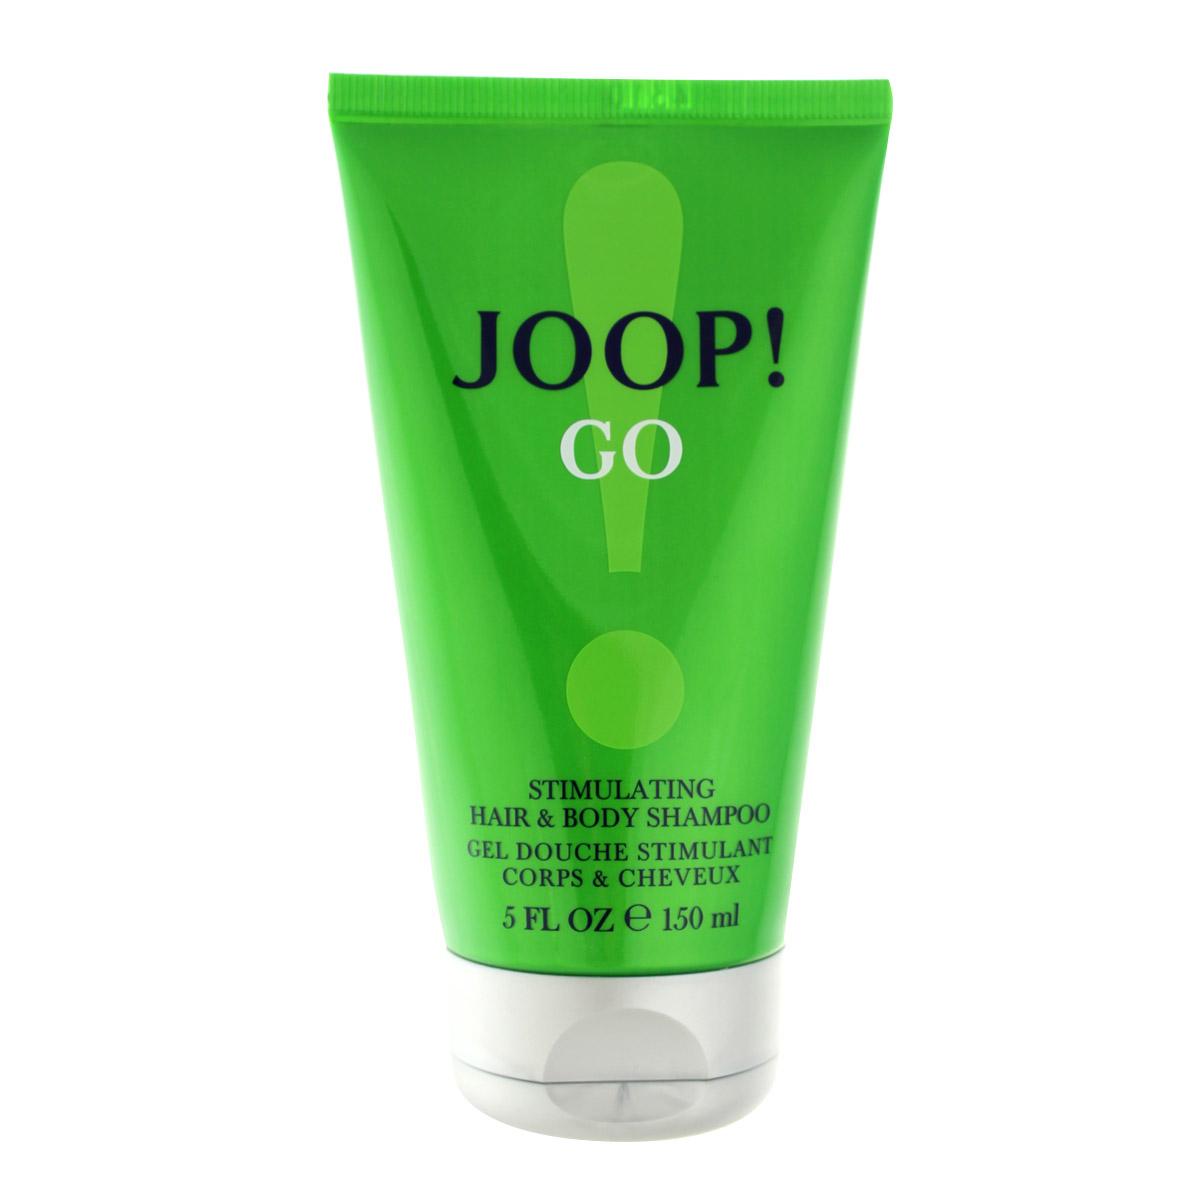 JOOP GO SG 150 ml M